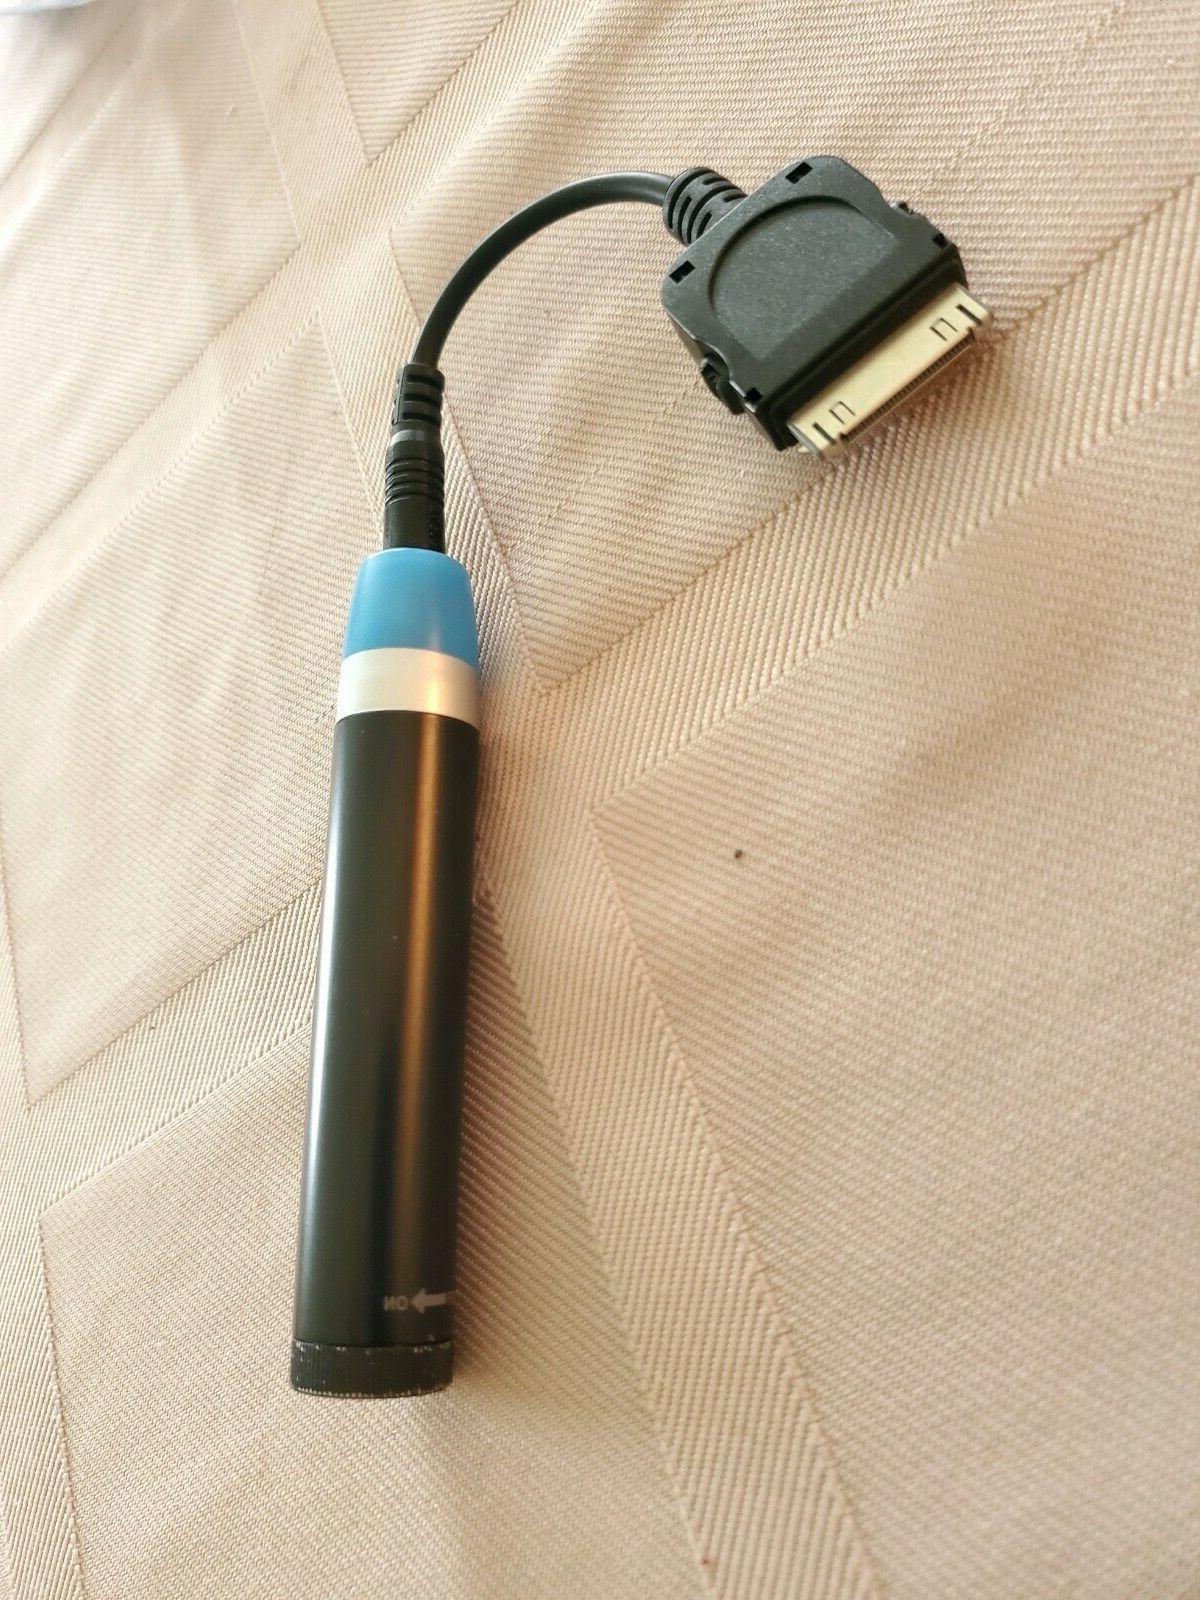 IPOD NANO Ear Power Charger Adapter IPOD